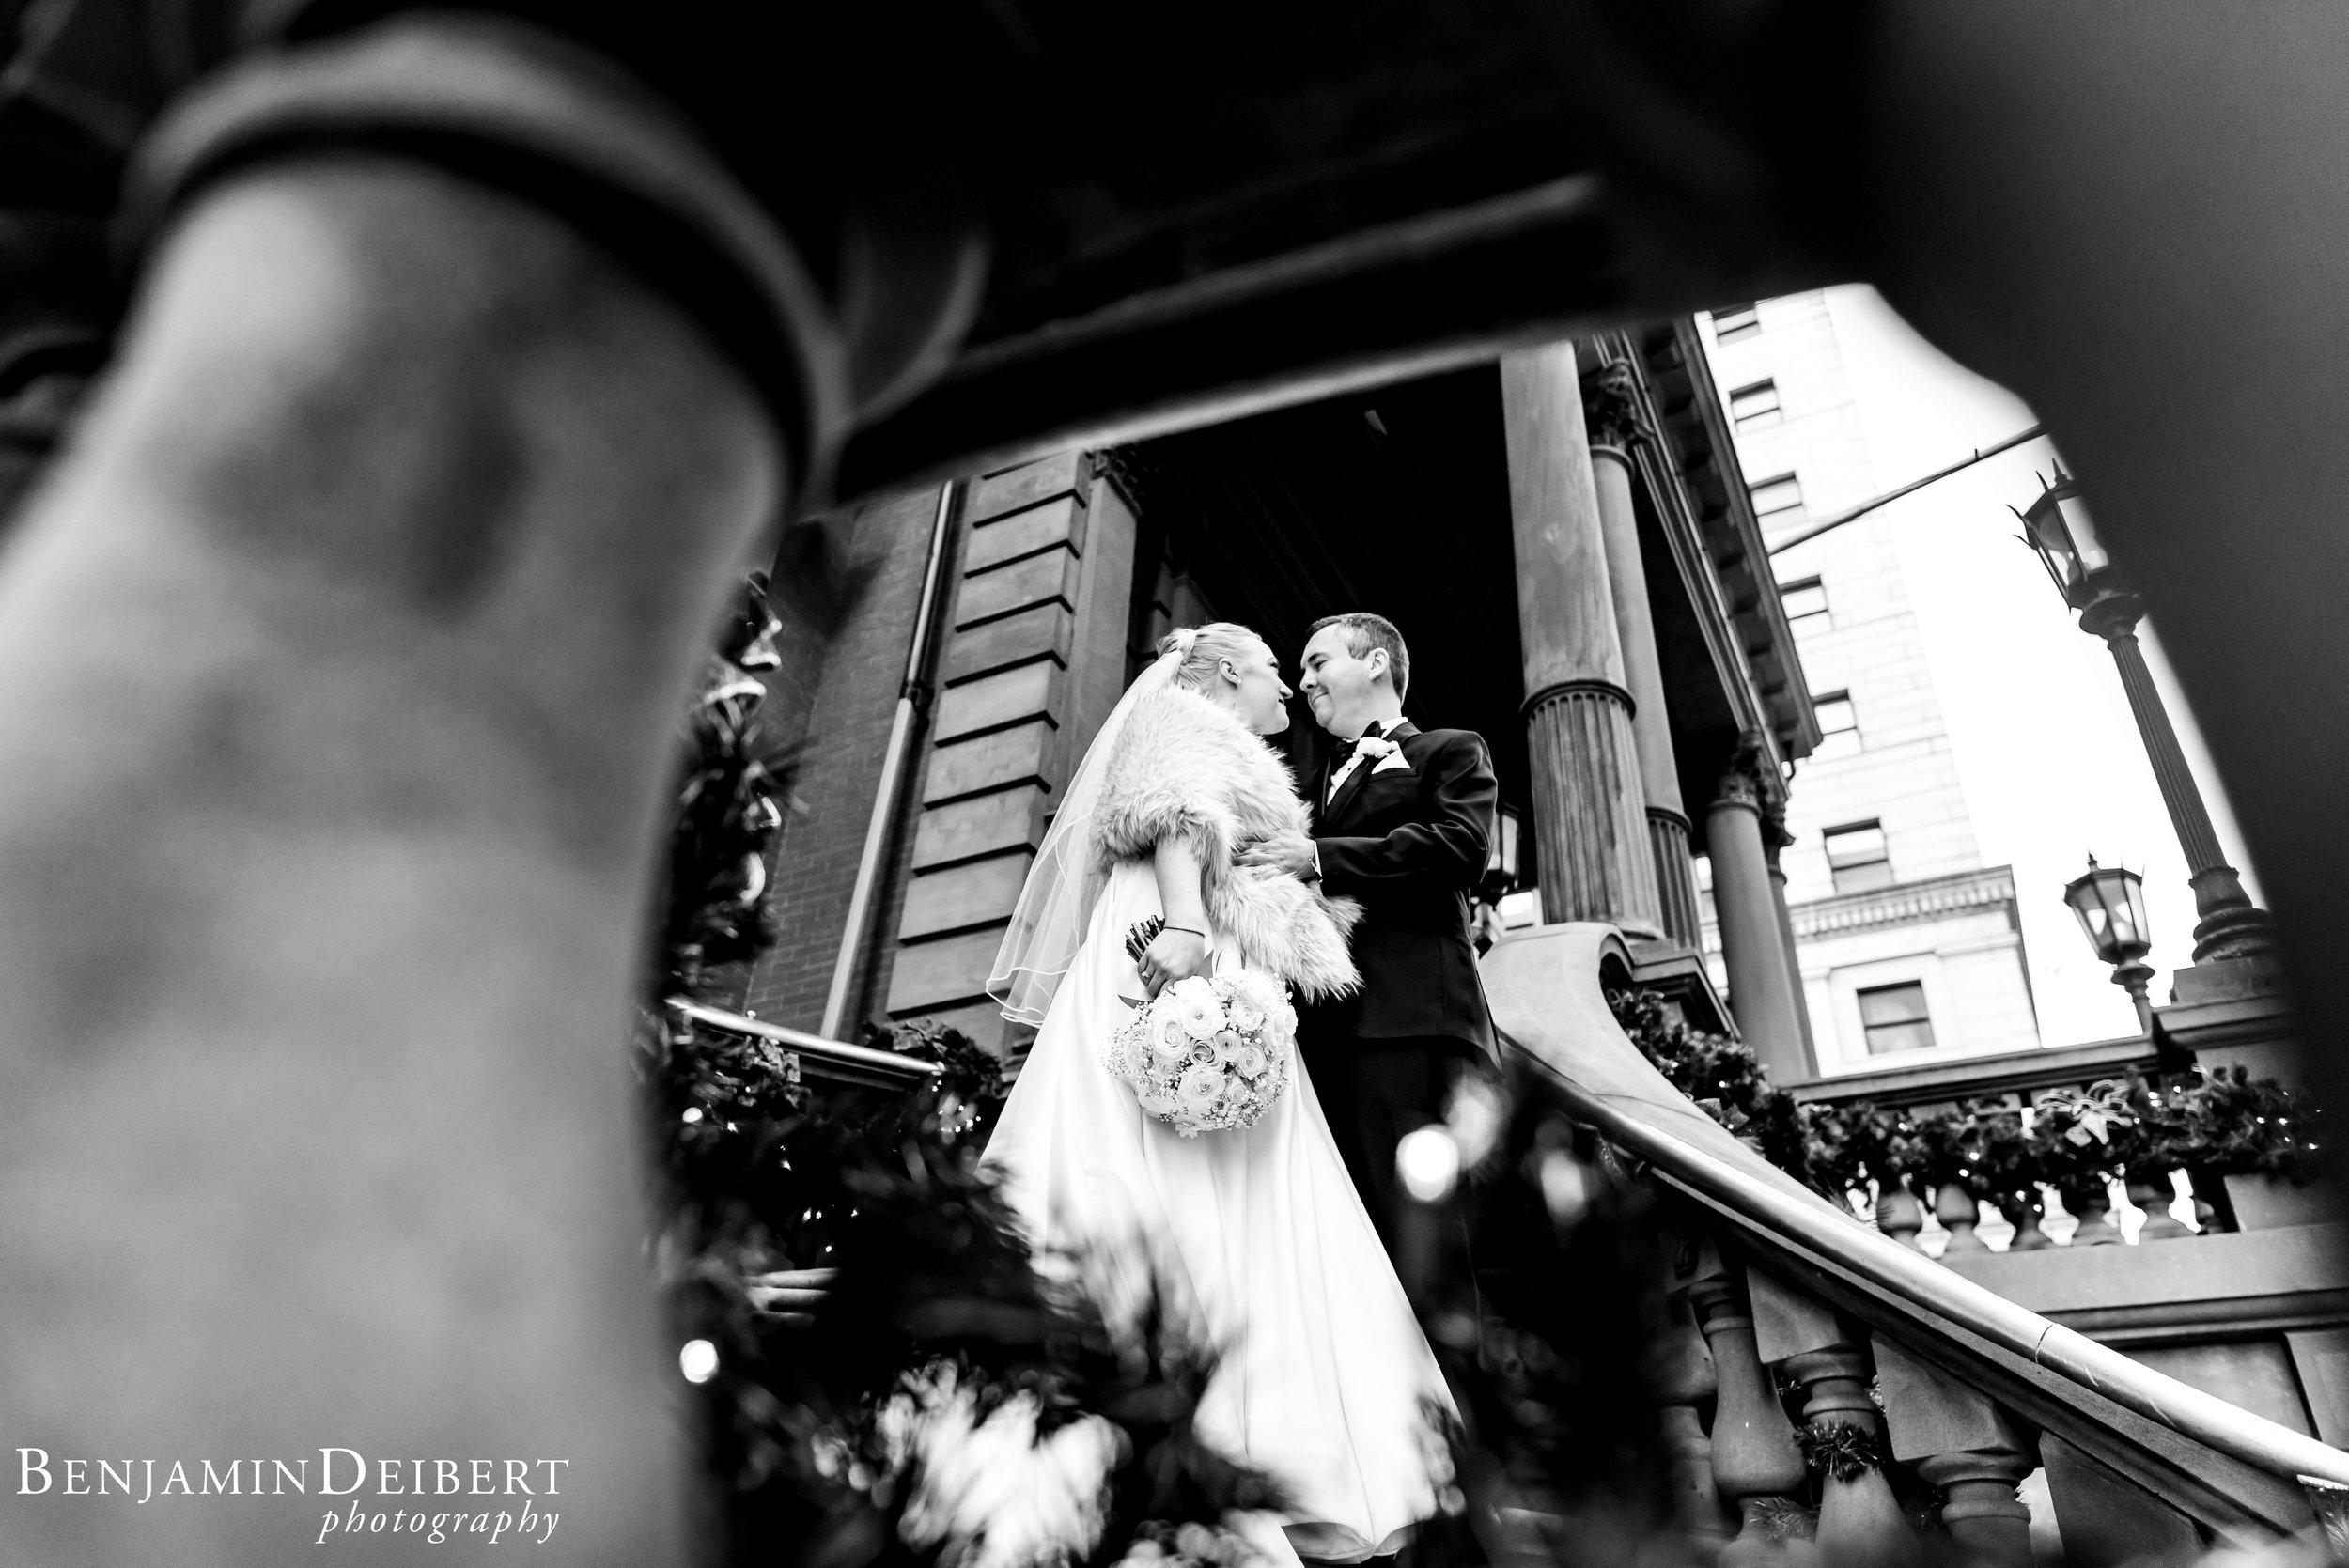 PatriceandAdam_TheLucy__Cescaphe_Wedding-23.jpg